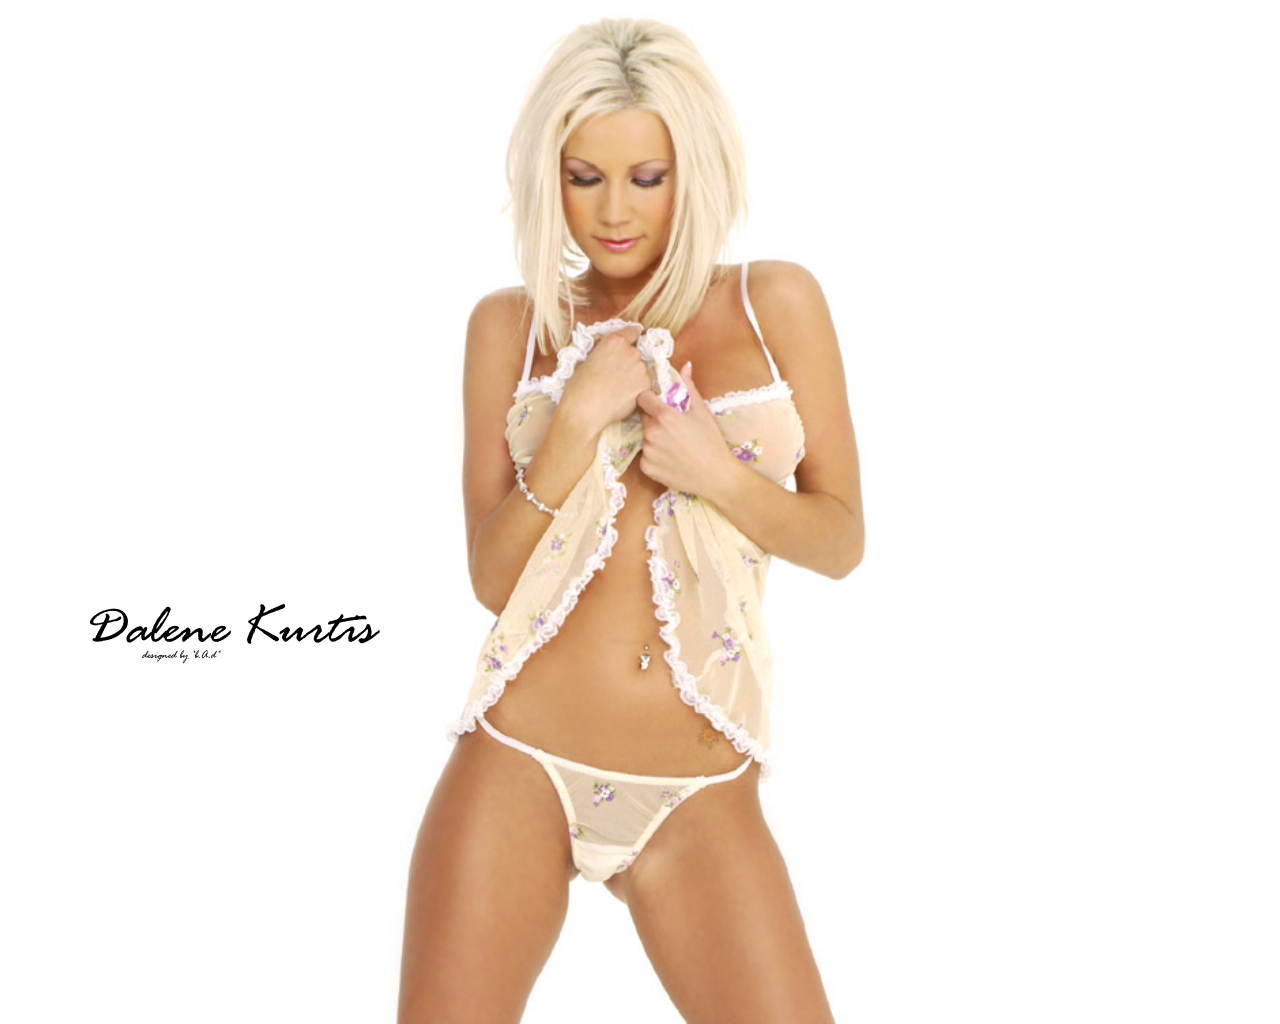 Download High quality Dalene Kurtis wallpaper / Celebrities Female / 1280x1024